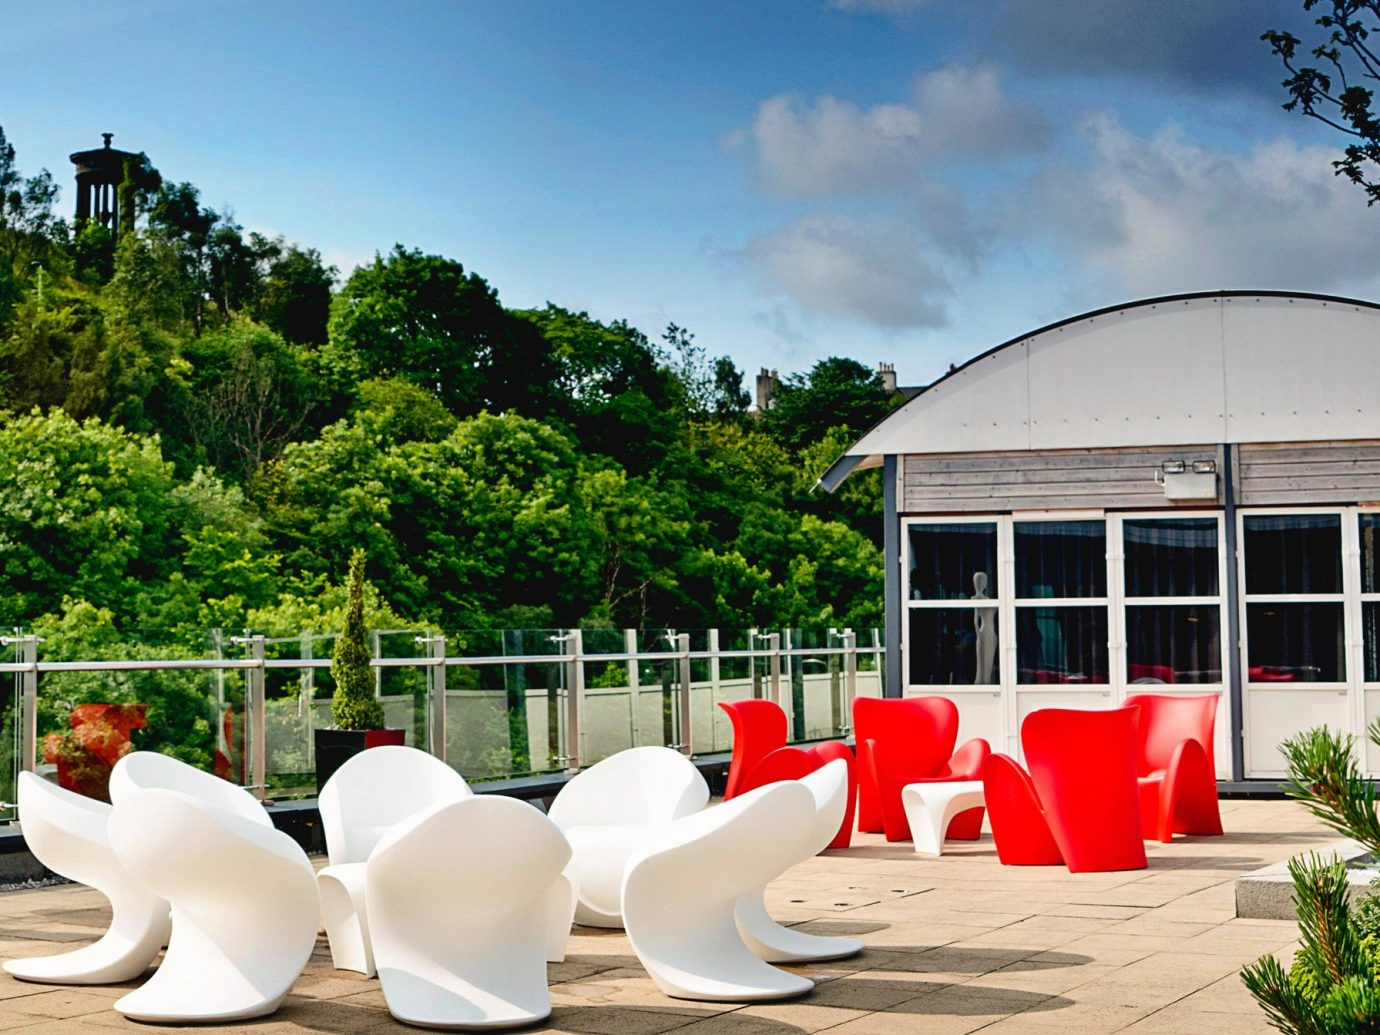 Edinburgh Hotels Jetsetter Guides Scotland Travel Tips Trip Ideas leisure recreation outdoor structure estate tourism park tree pavilion backyard gazebo hacienda plant